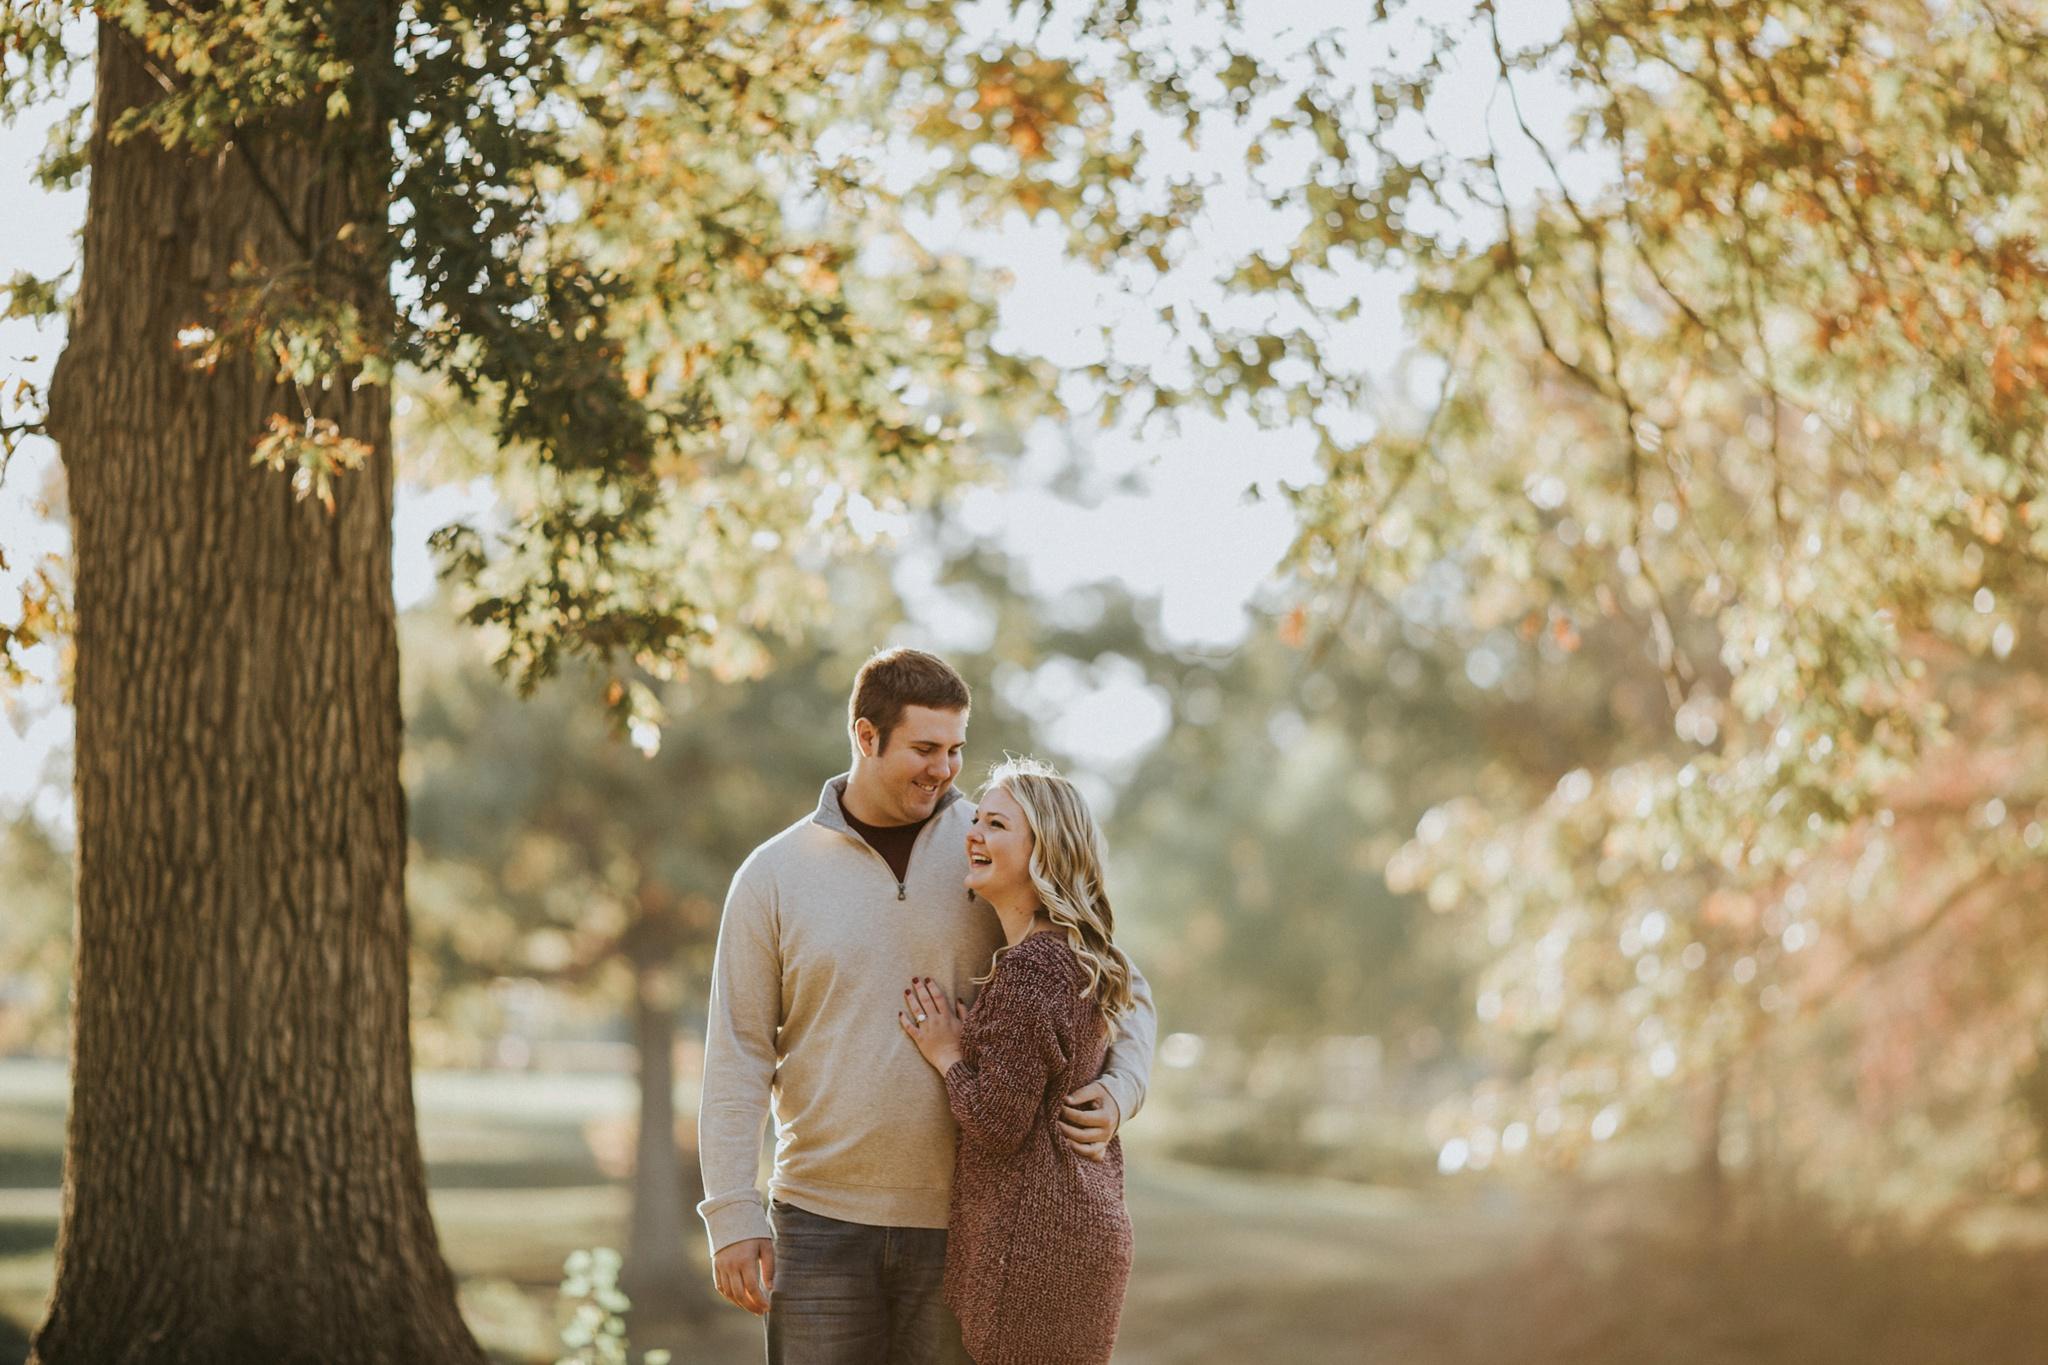 Bosse-Field-Engagement-Photos-Evansville_0019.jpg